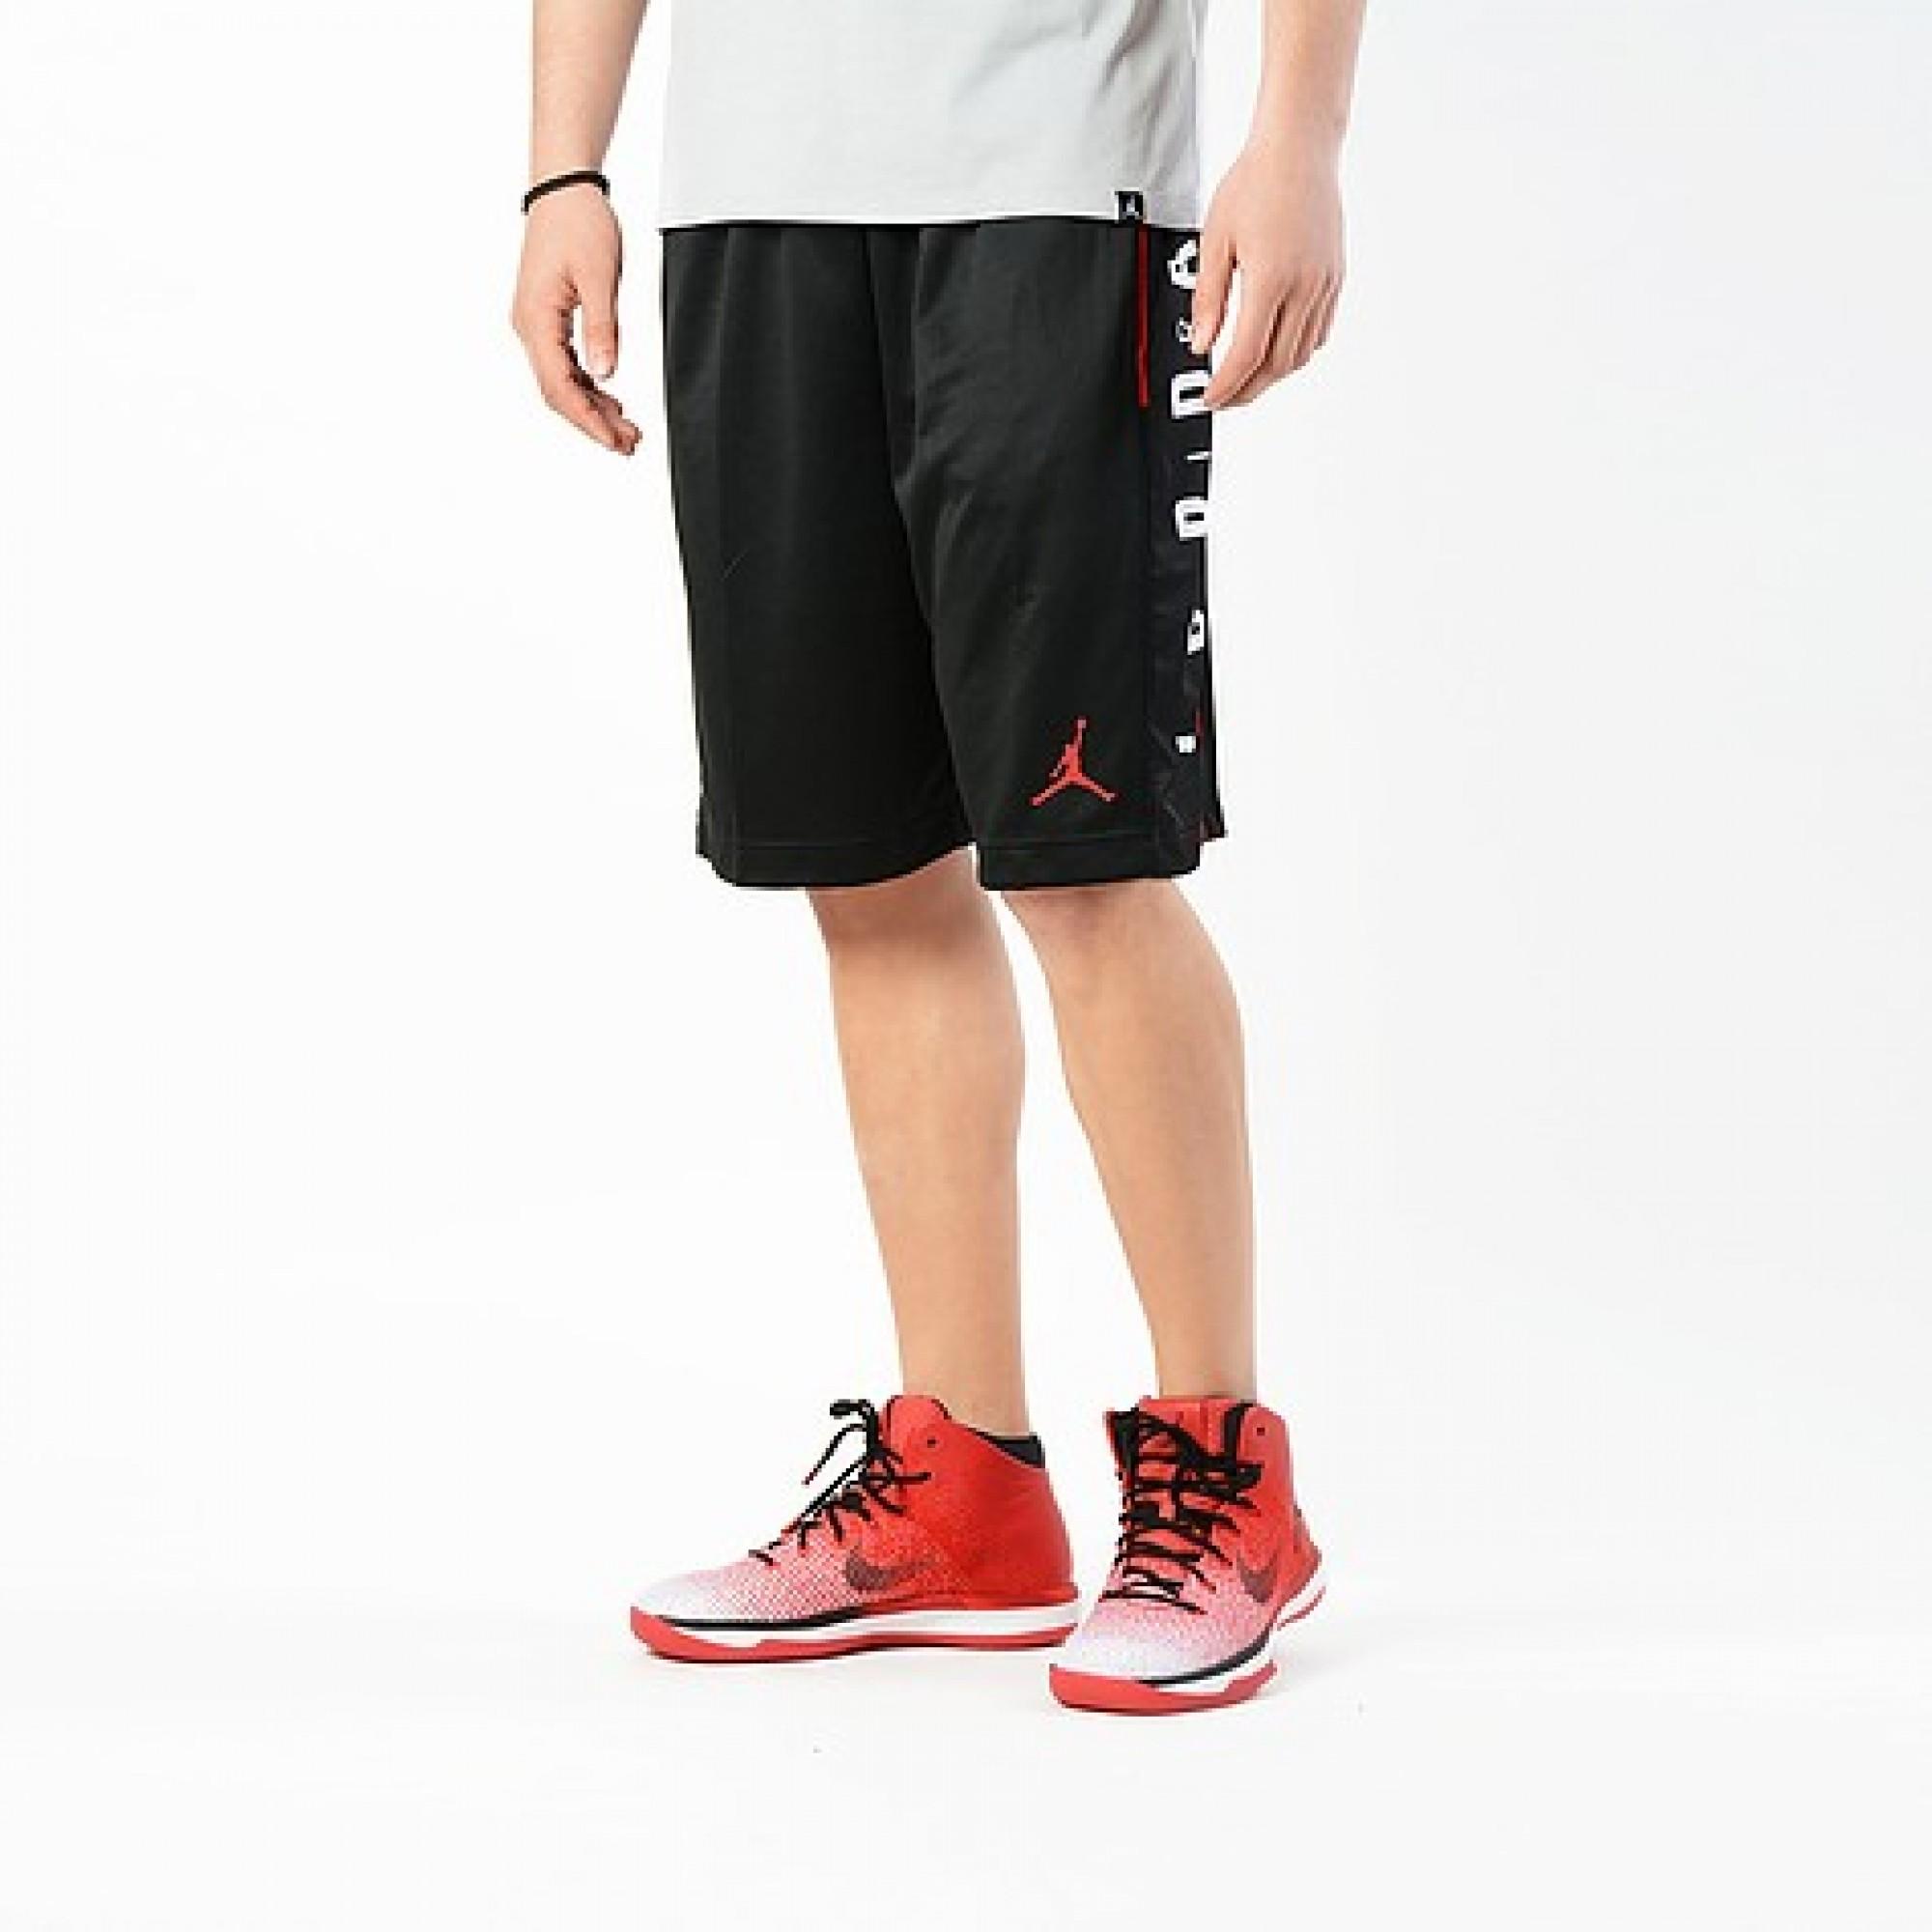 2c829891b69 Jordan Men's Rise Graphic Shorts In Black | 888376-010